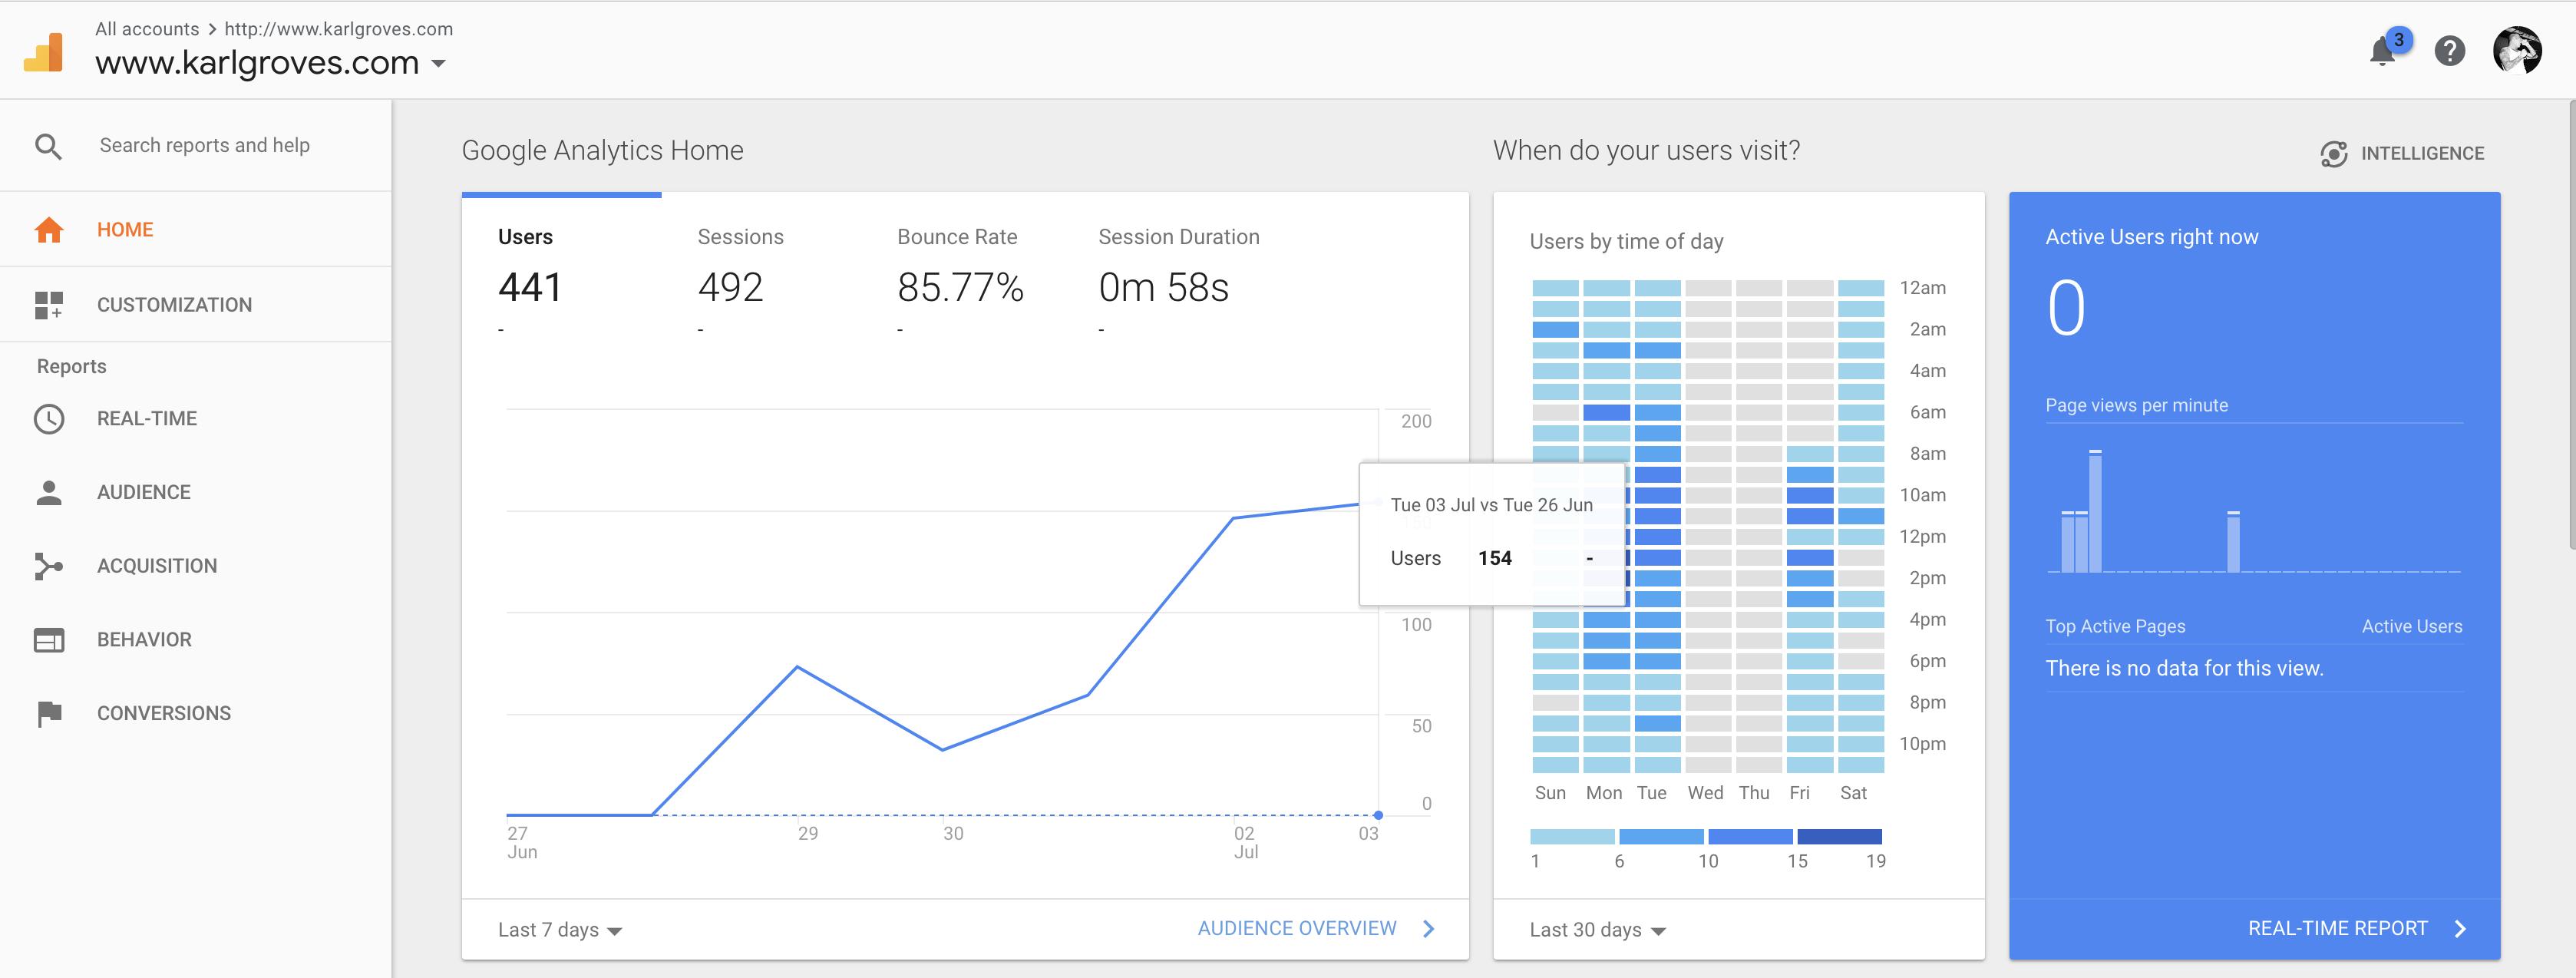 Screenshot of Google Analytics landing page for Karlgroves.com